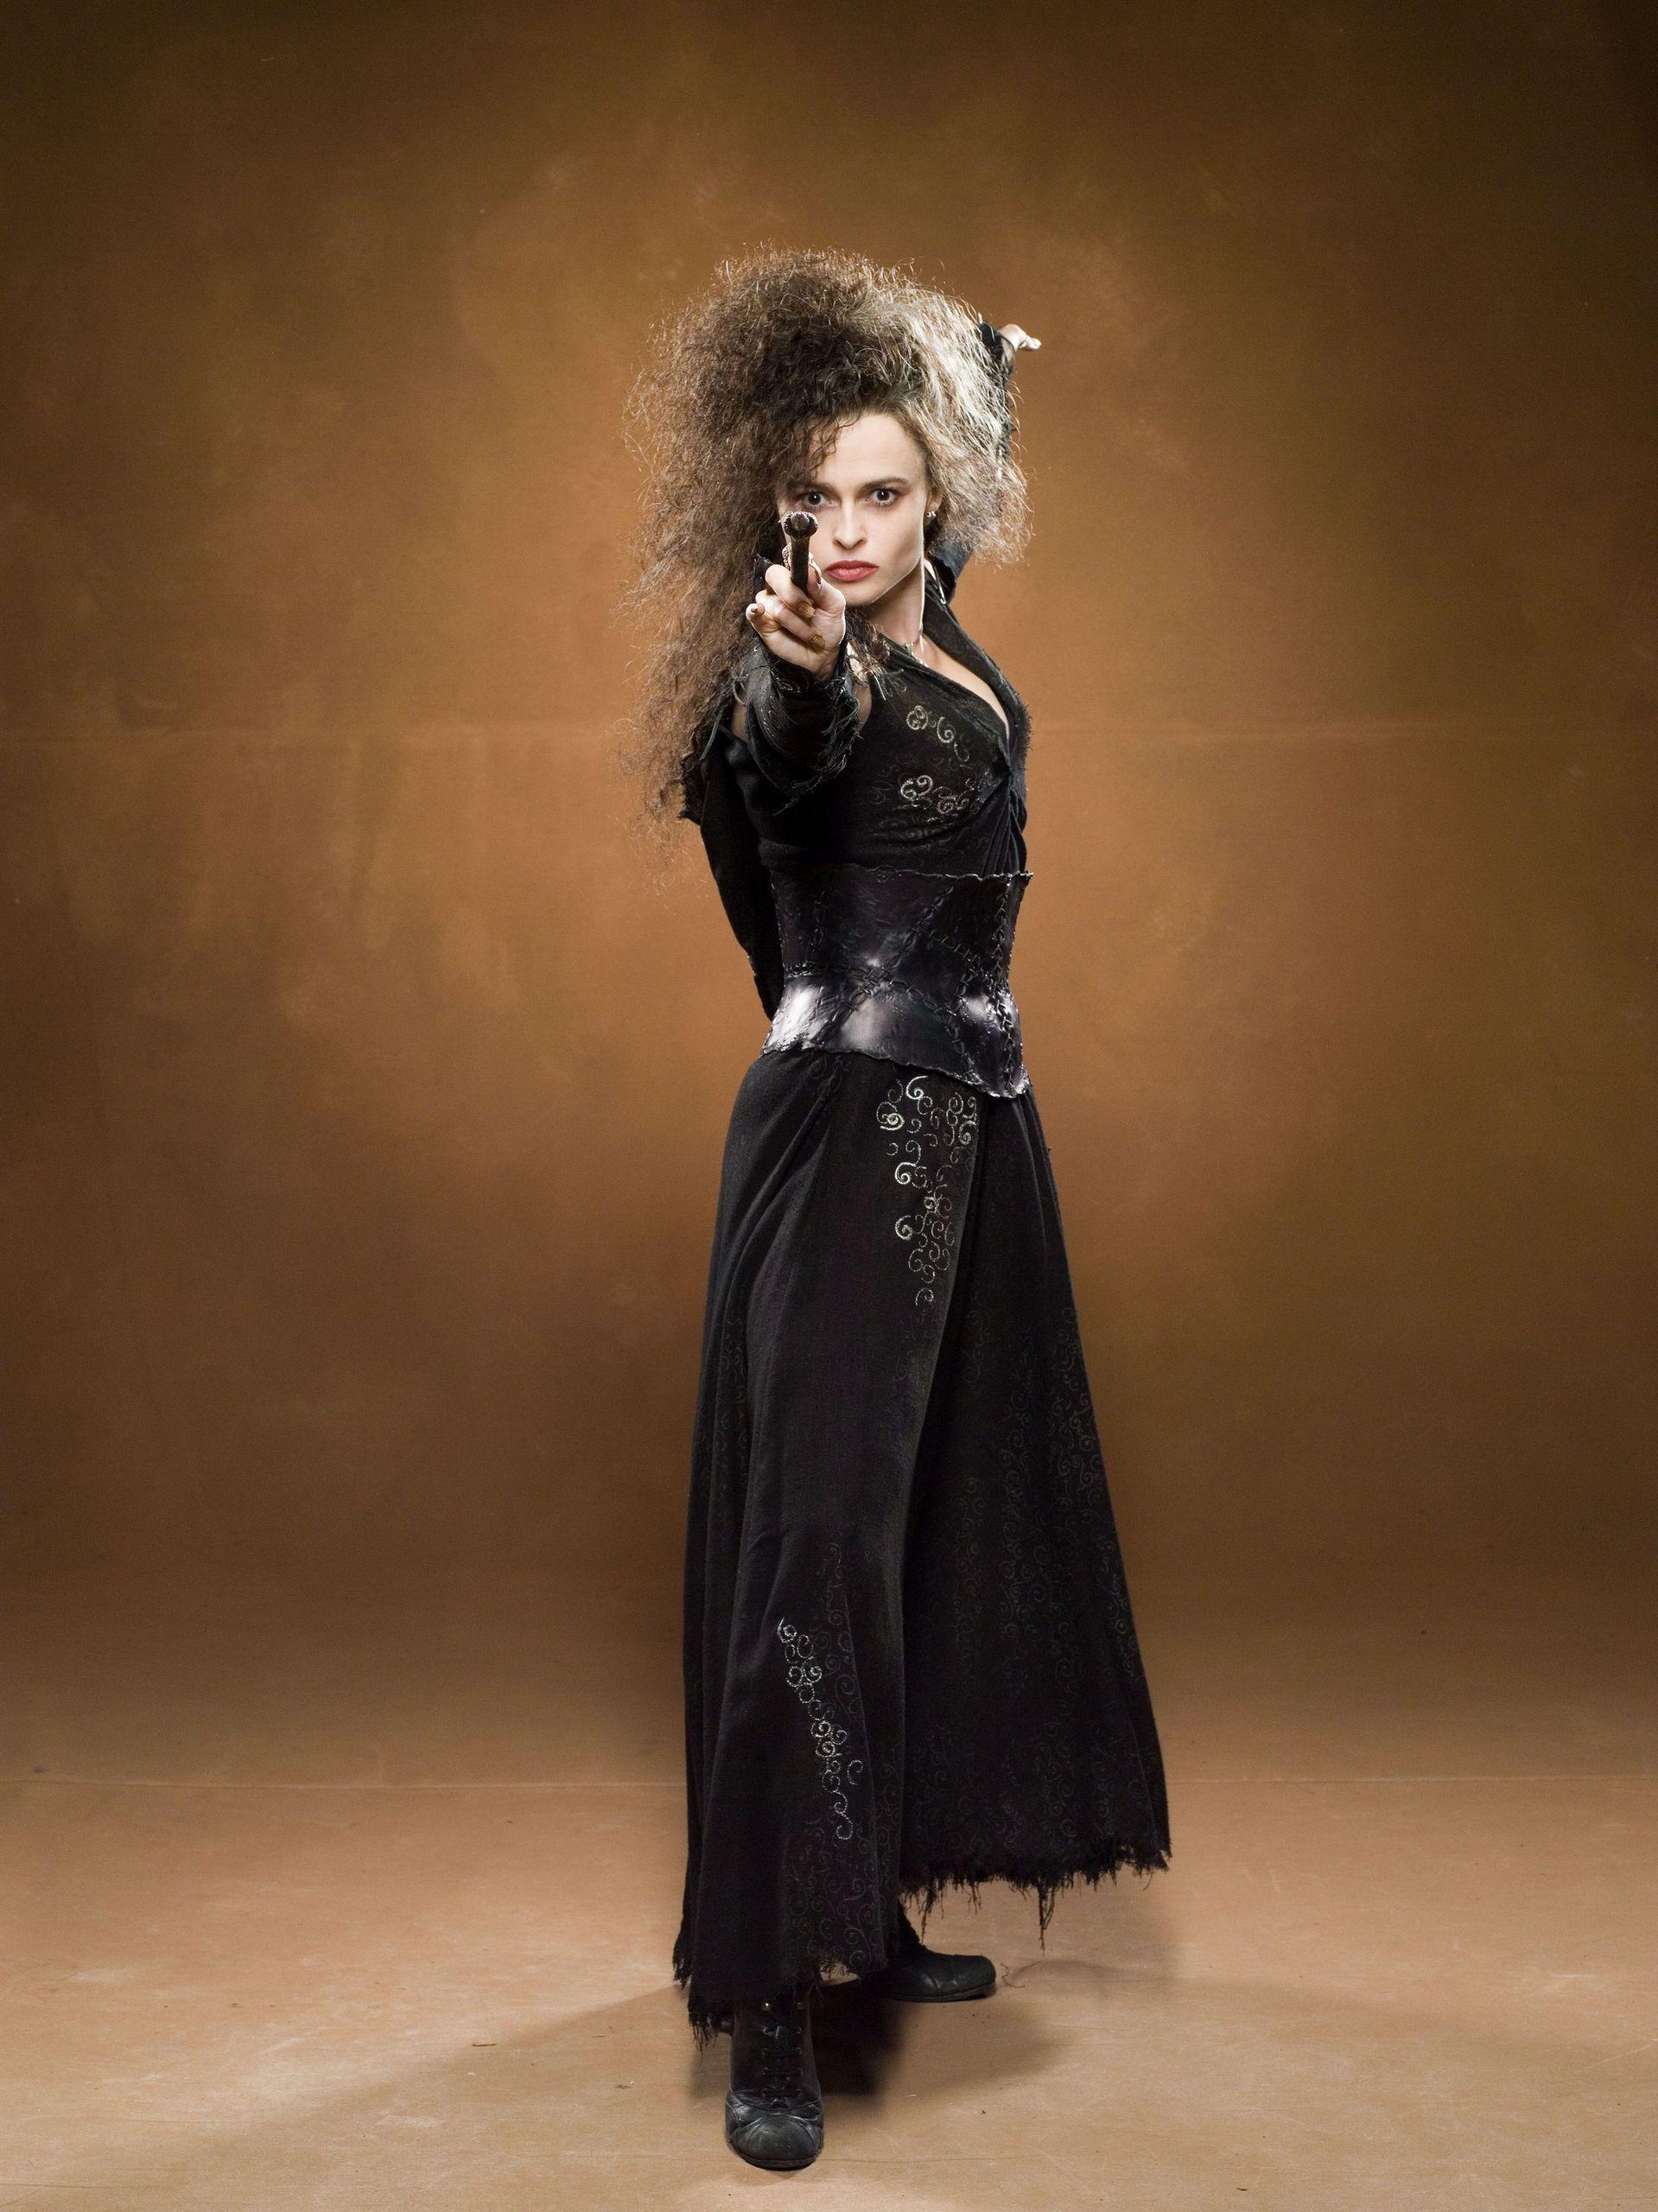 Bellatrix Lestrange Photo Bellatrix Lestrange Harry Potter Costume Bellatrix Lestrange Costume Harry Potter Cosplay